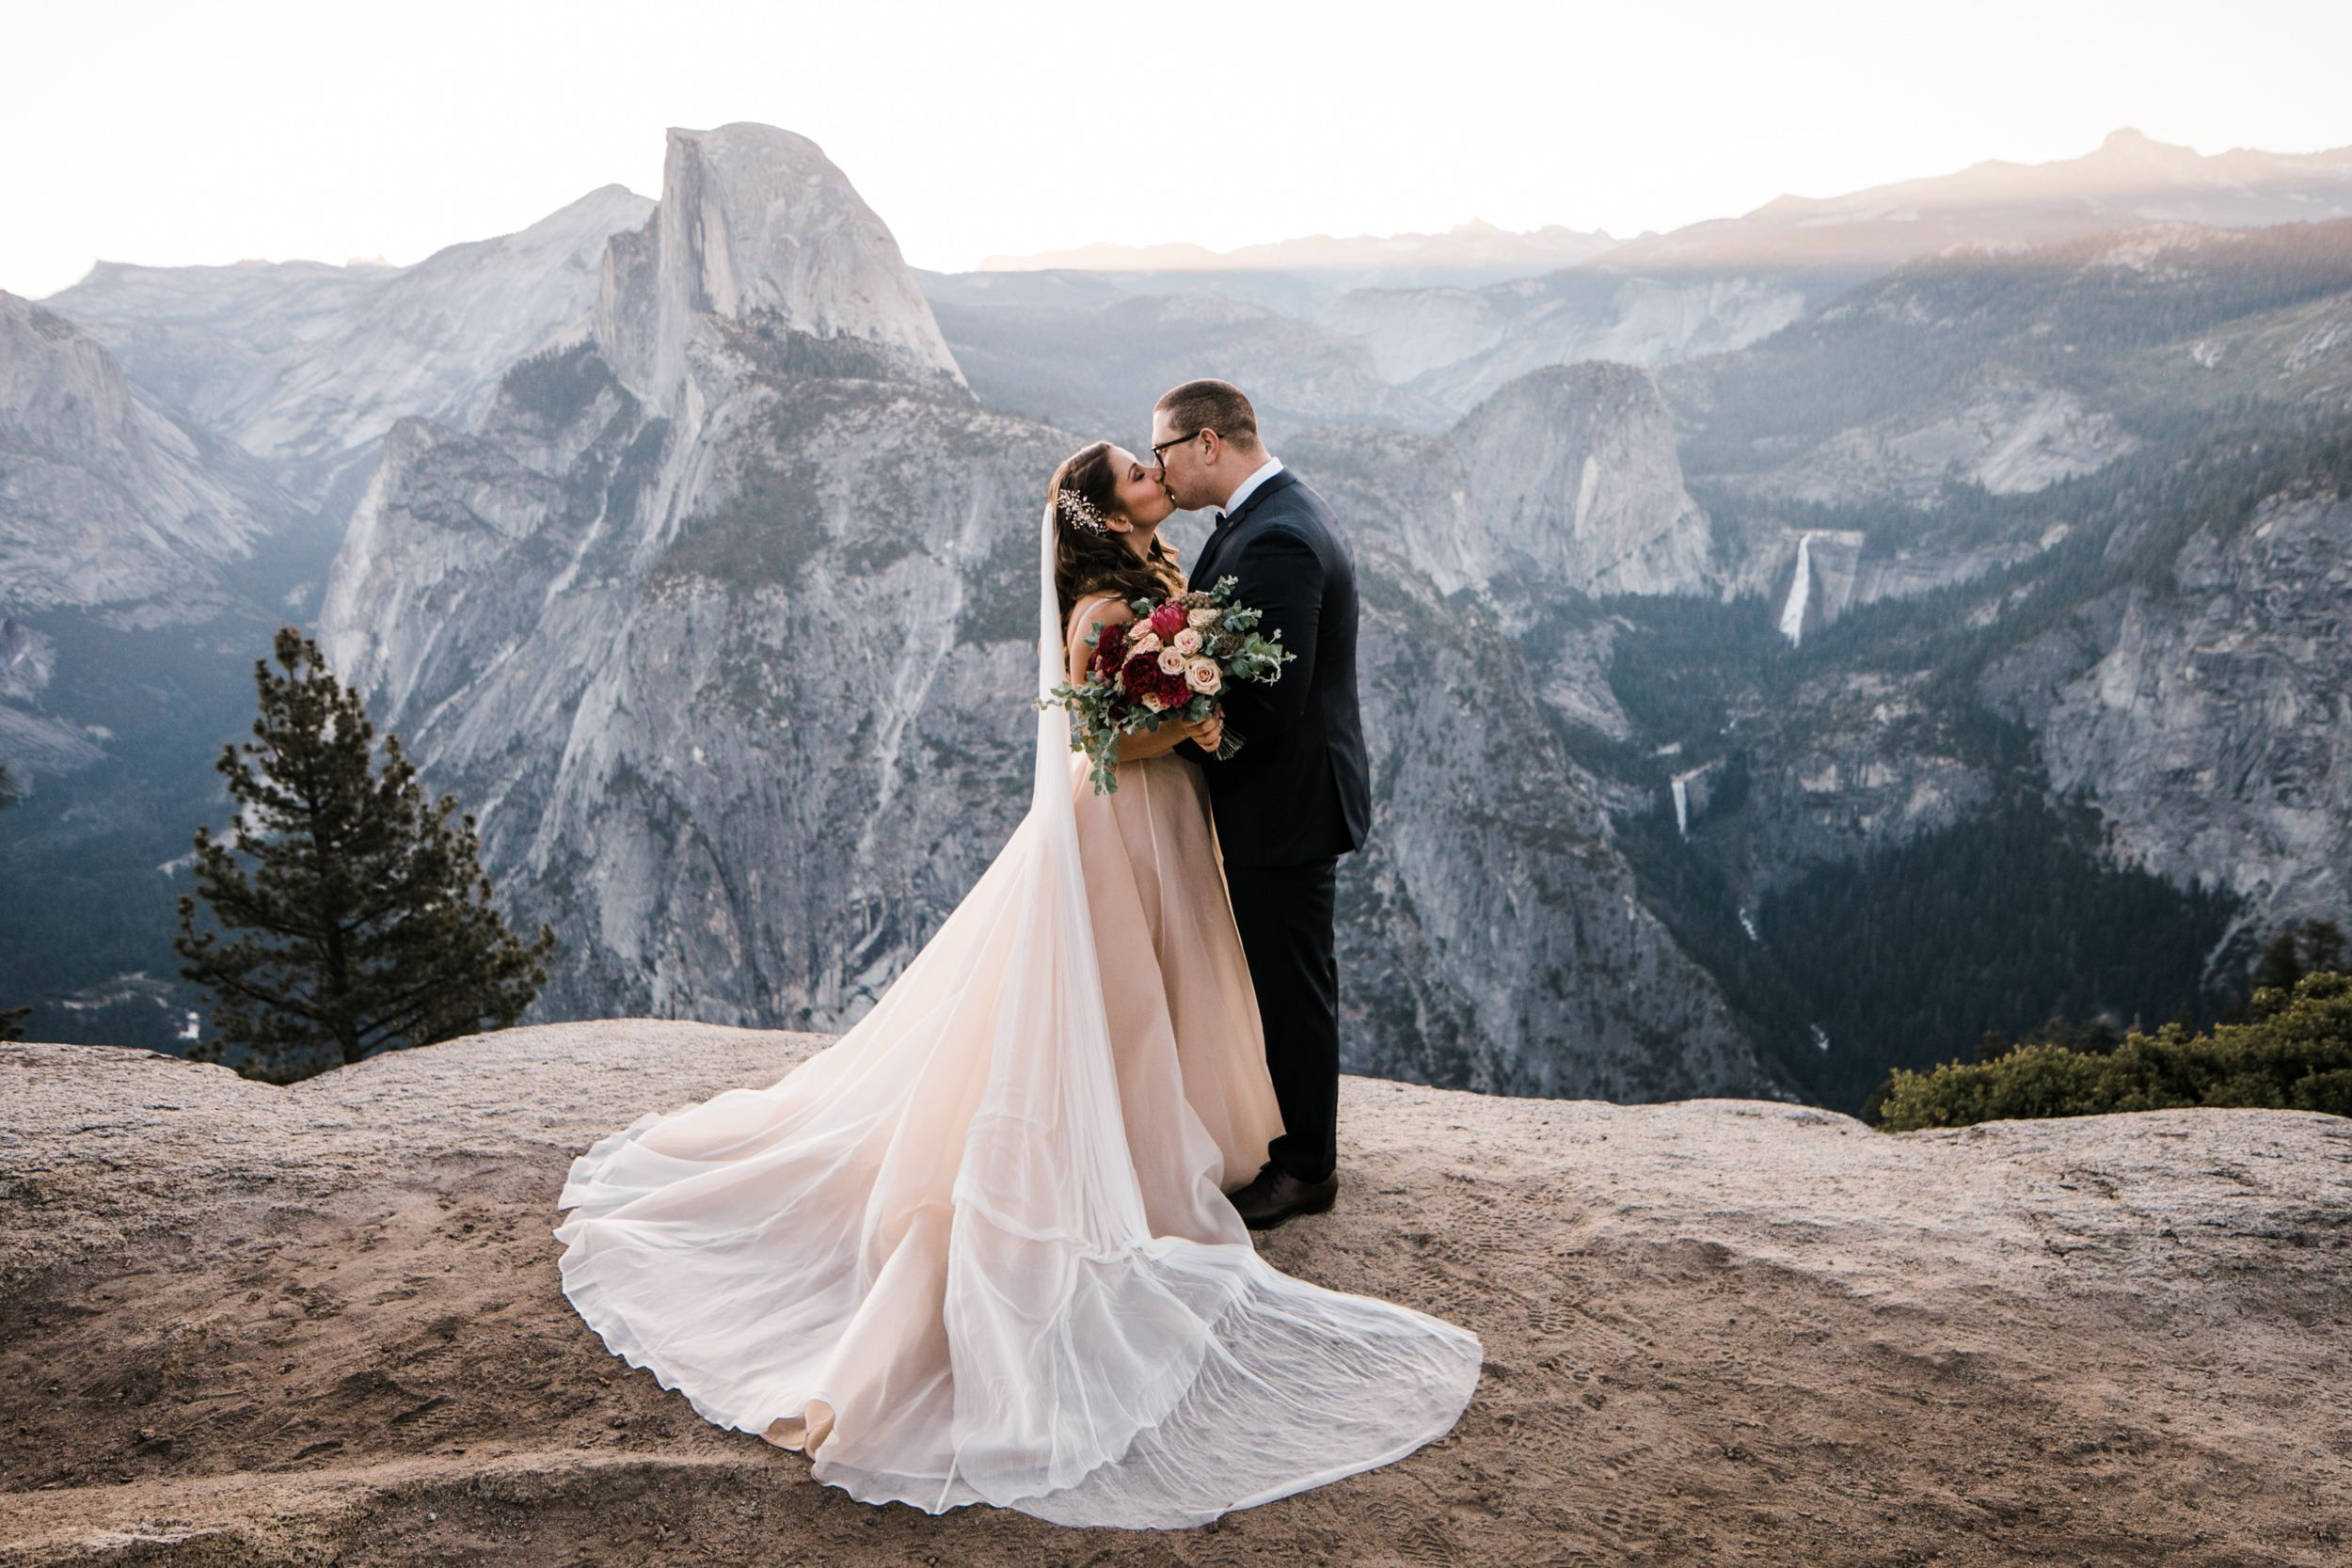 Yosemite National Park Destination Elopement Yosemite Wedding Photographer Adventure Wedding Elopement Photographers In Moab Yosemite And Beyond The H Yosemite Wedding Elope Wedding Adventure Wedding